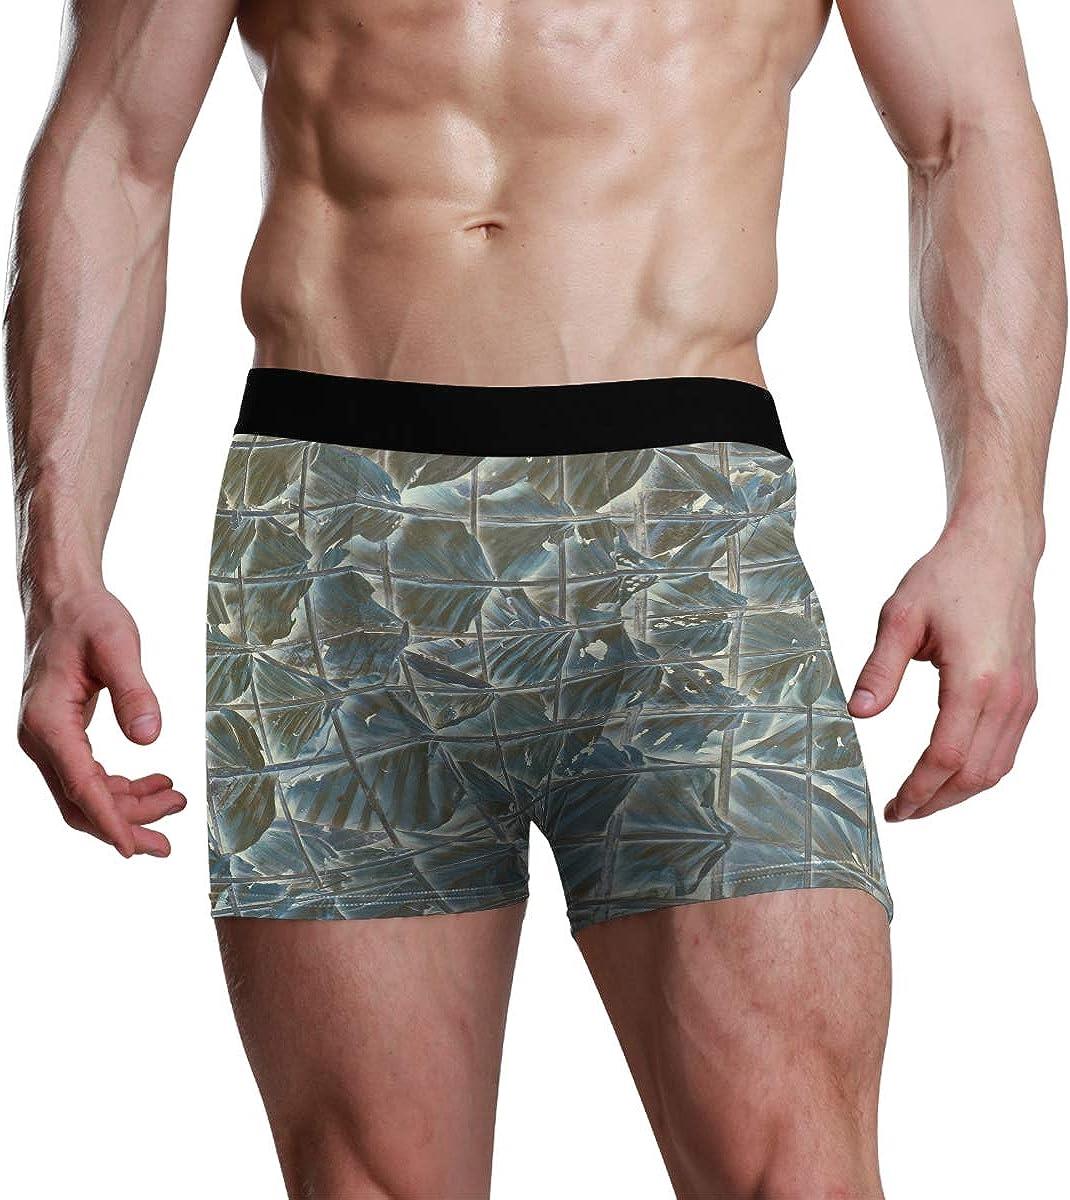 HangWang Men's Boxer Briefs Abstract Dry Leaves Eye-Opening Bikini Underwear Stretch Trunks Boys Underpants